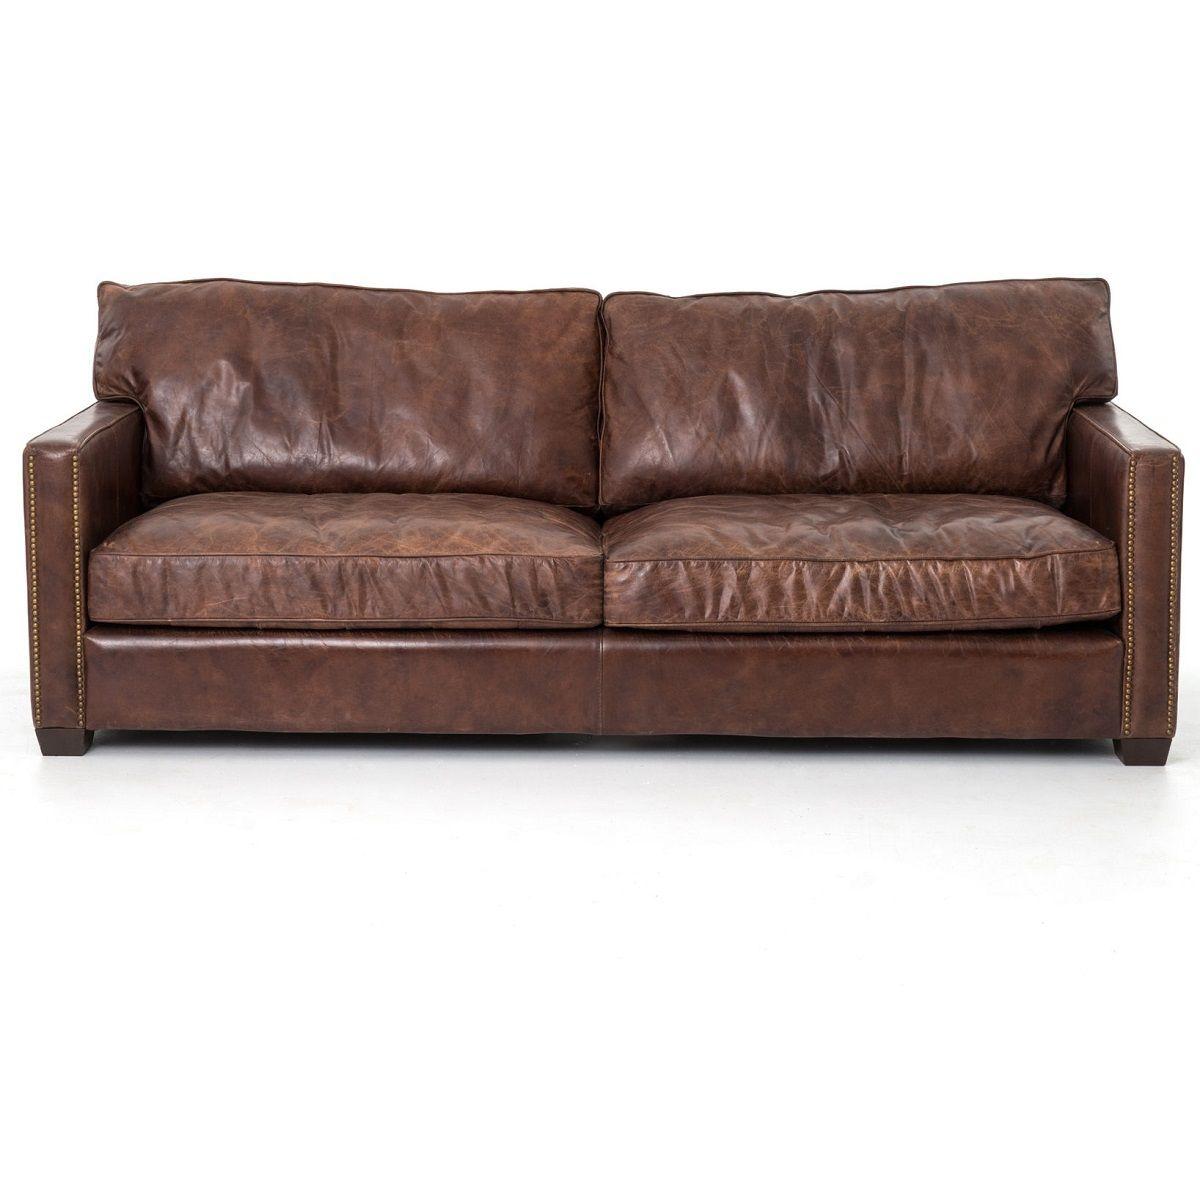 Larkin 3 Seater Vintage Cigar Distressed Leather Sofa Distressed Leather Sofa Distressed Leather Couch Vintage Leather Sofa